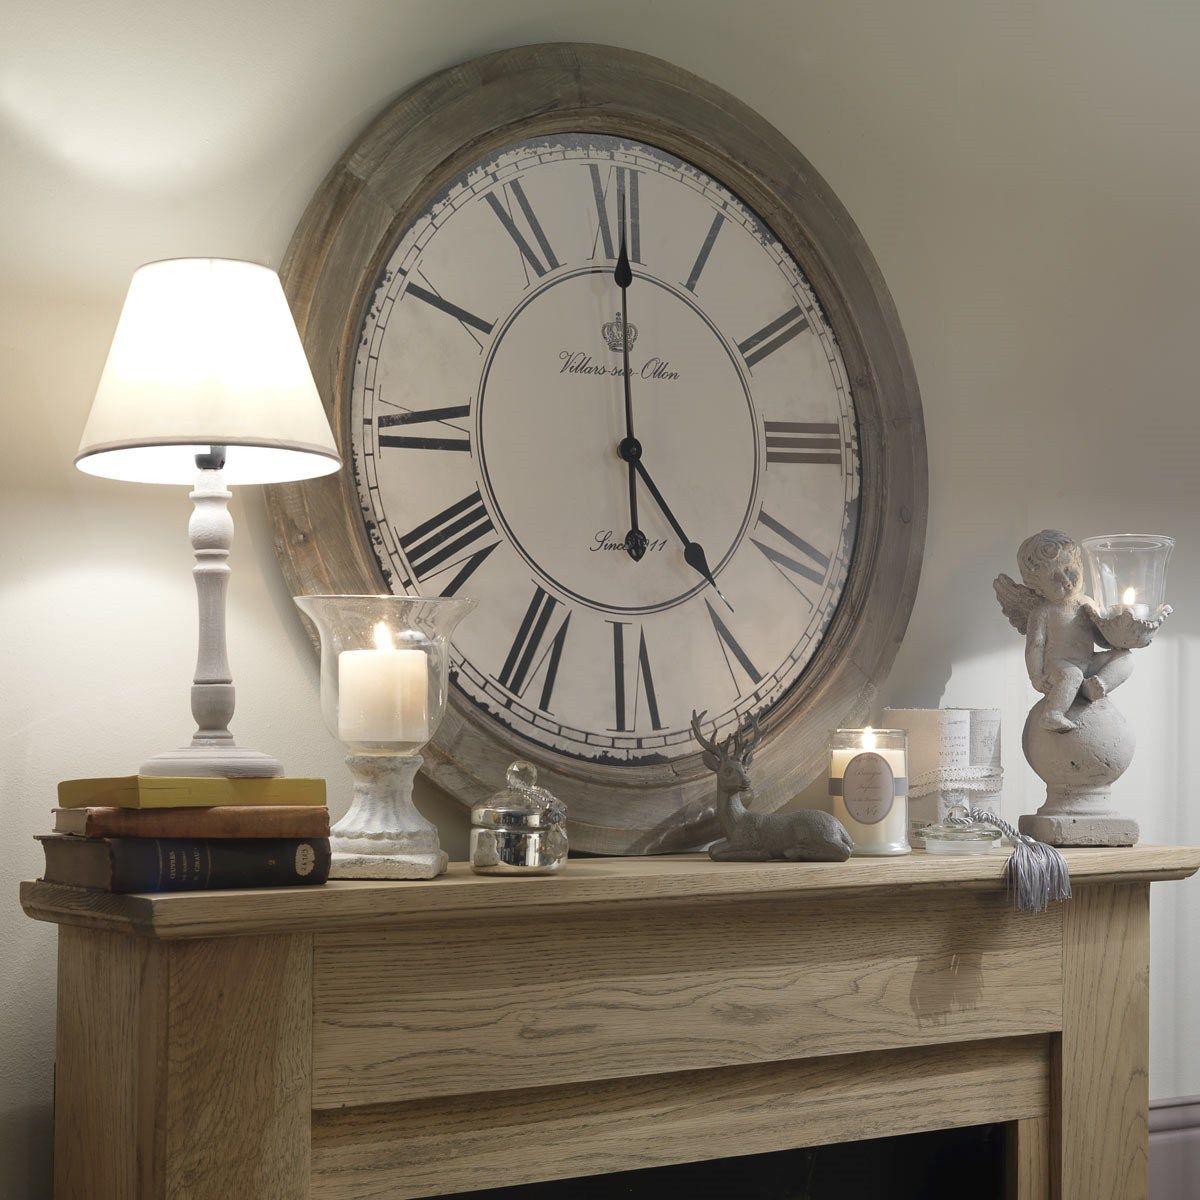 Landelijke klok - Klok woonkamer   Pinterest - Klok, Houten klok ...